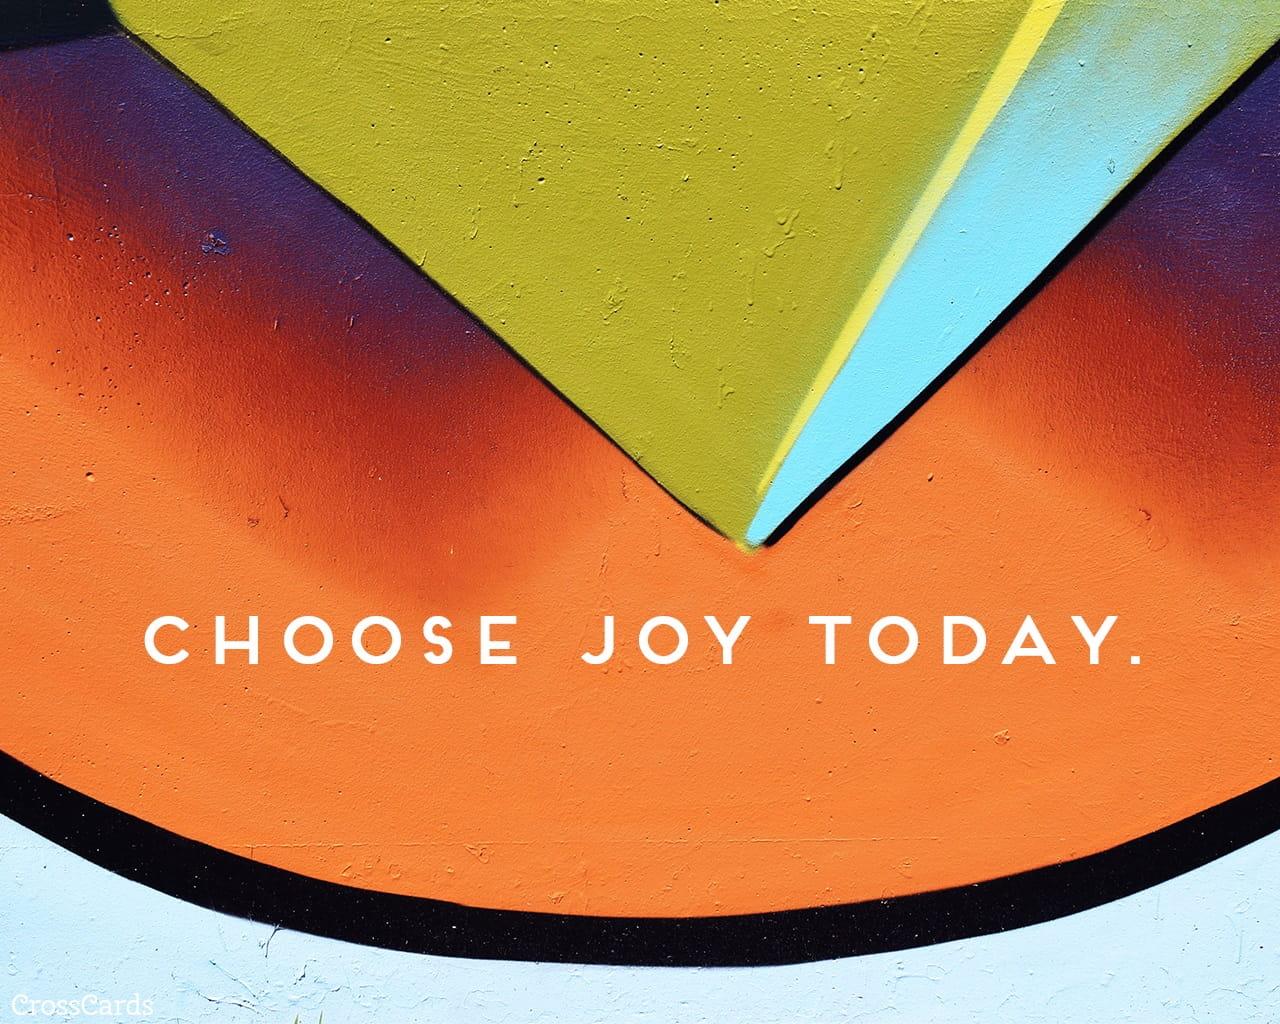 Choose Joy Today Desktop Wallpaper - Free Backgrounds